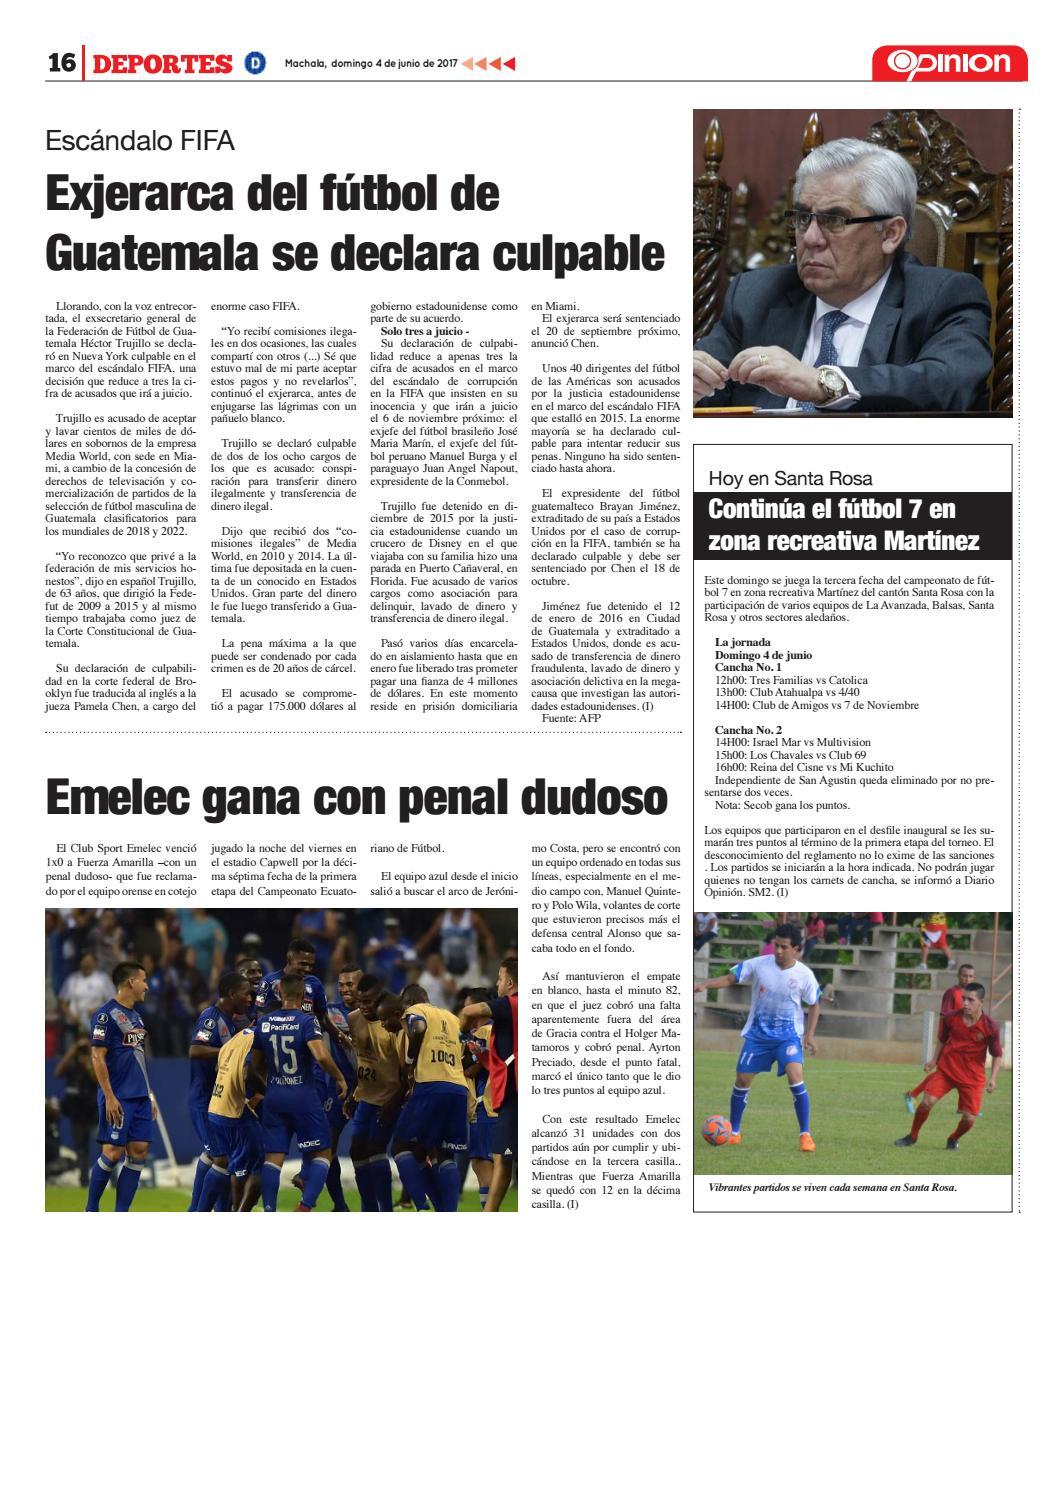 Impreso 04 06 17 by Diario Opinion - issuu